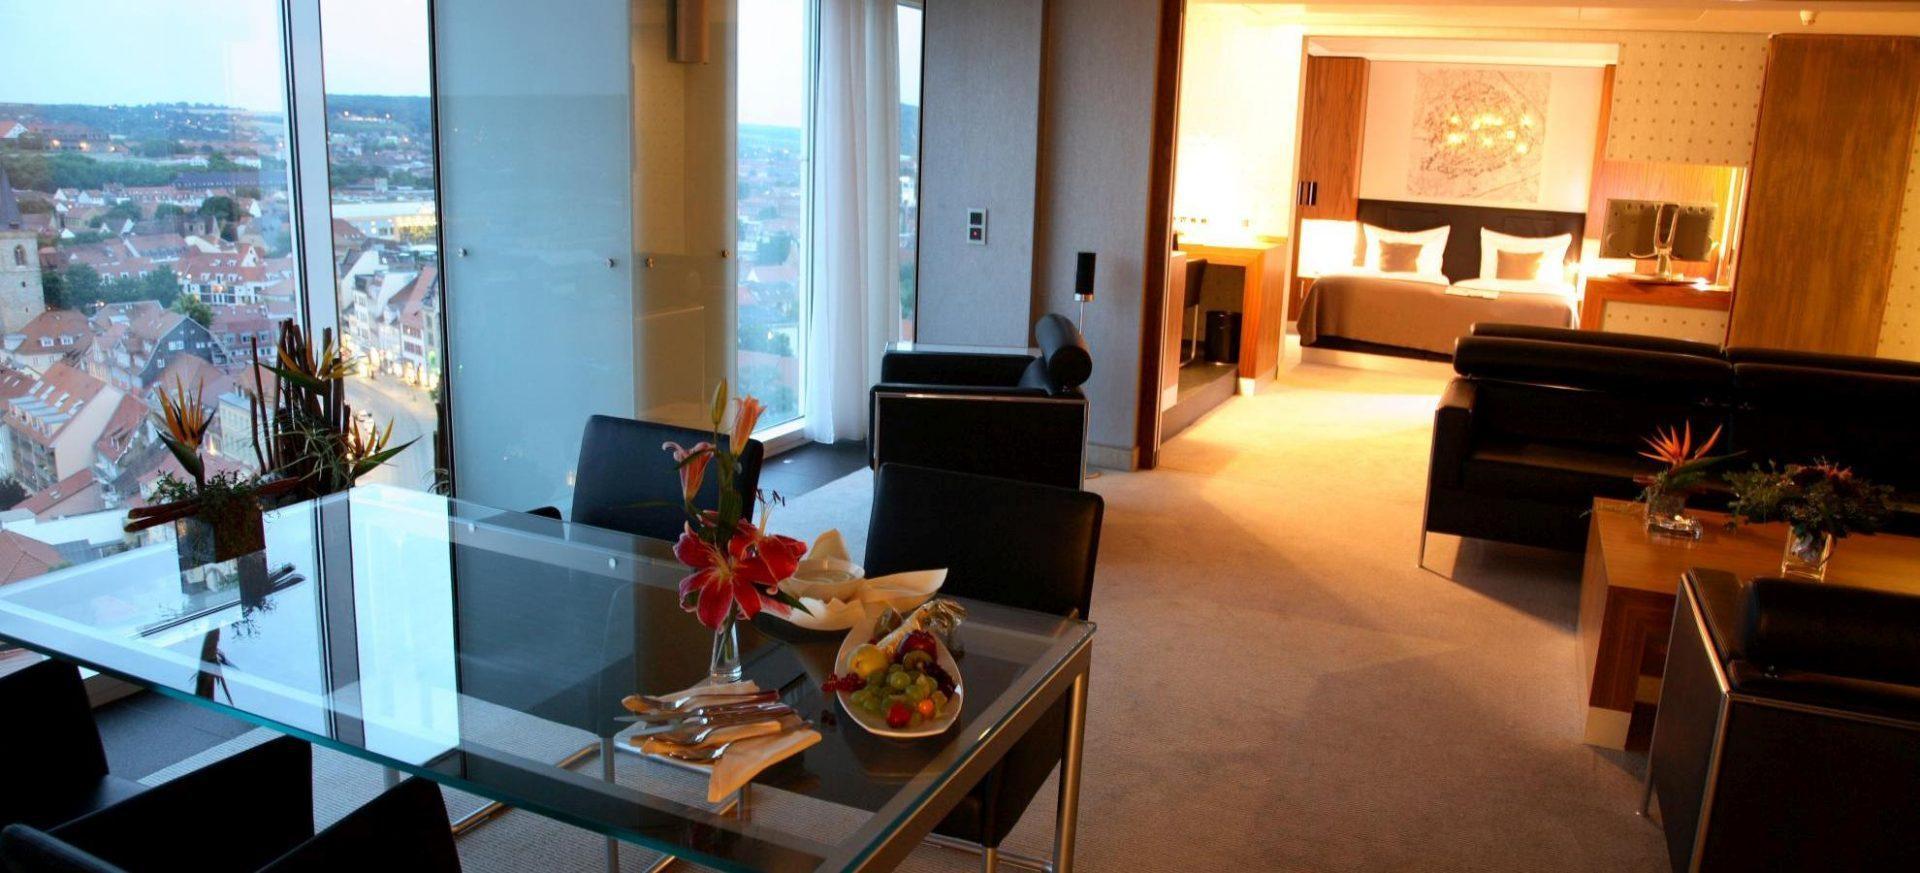 Radisson Blu Hotel Erfurt Präsidenten Suite